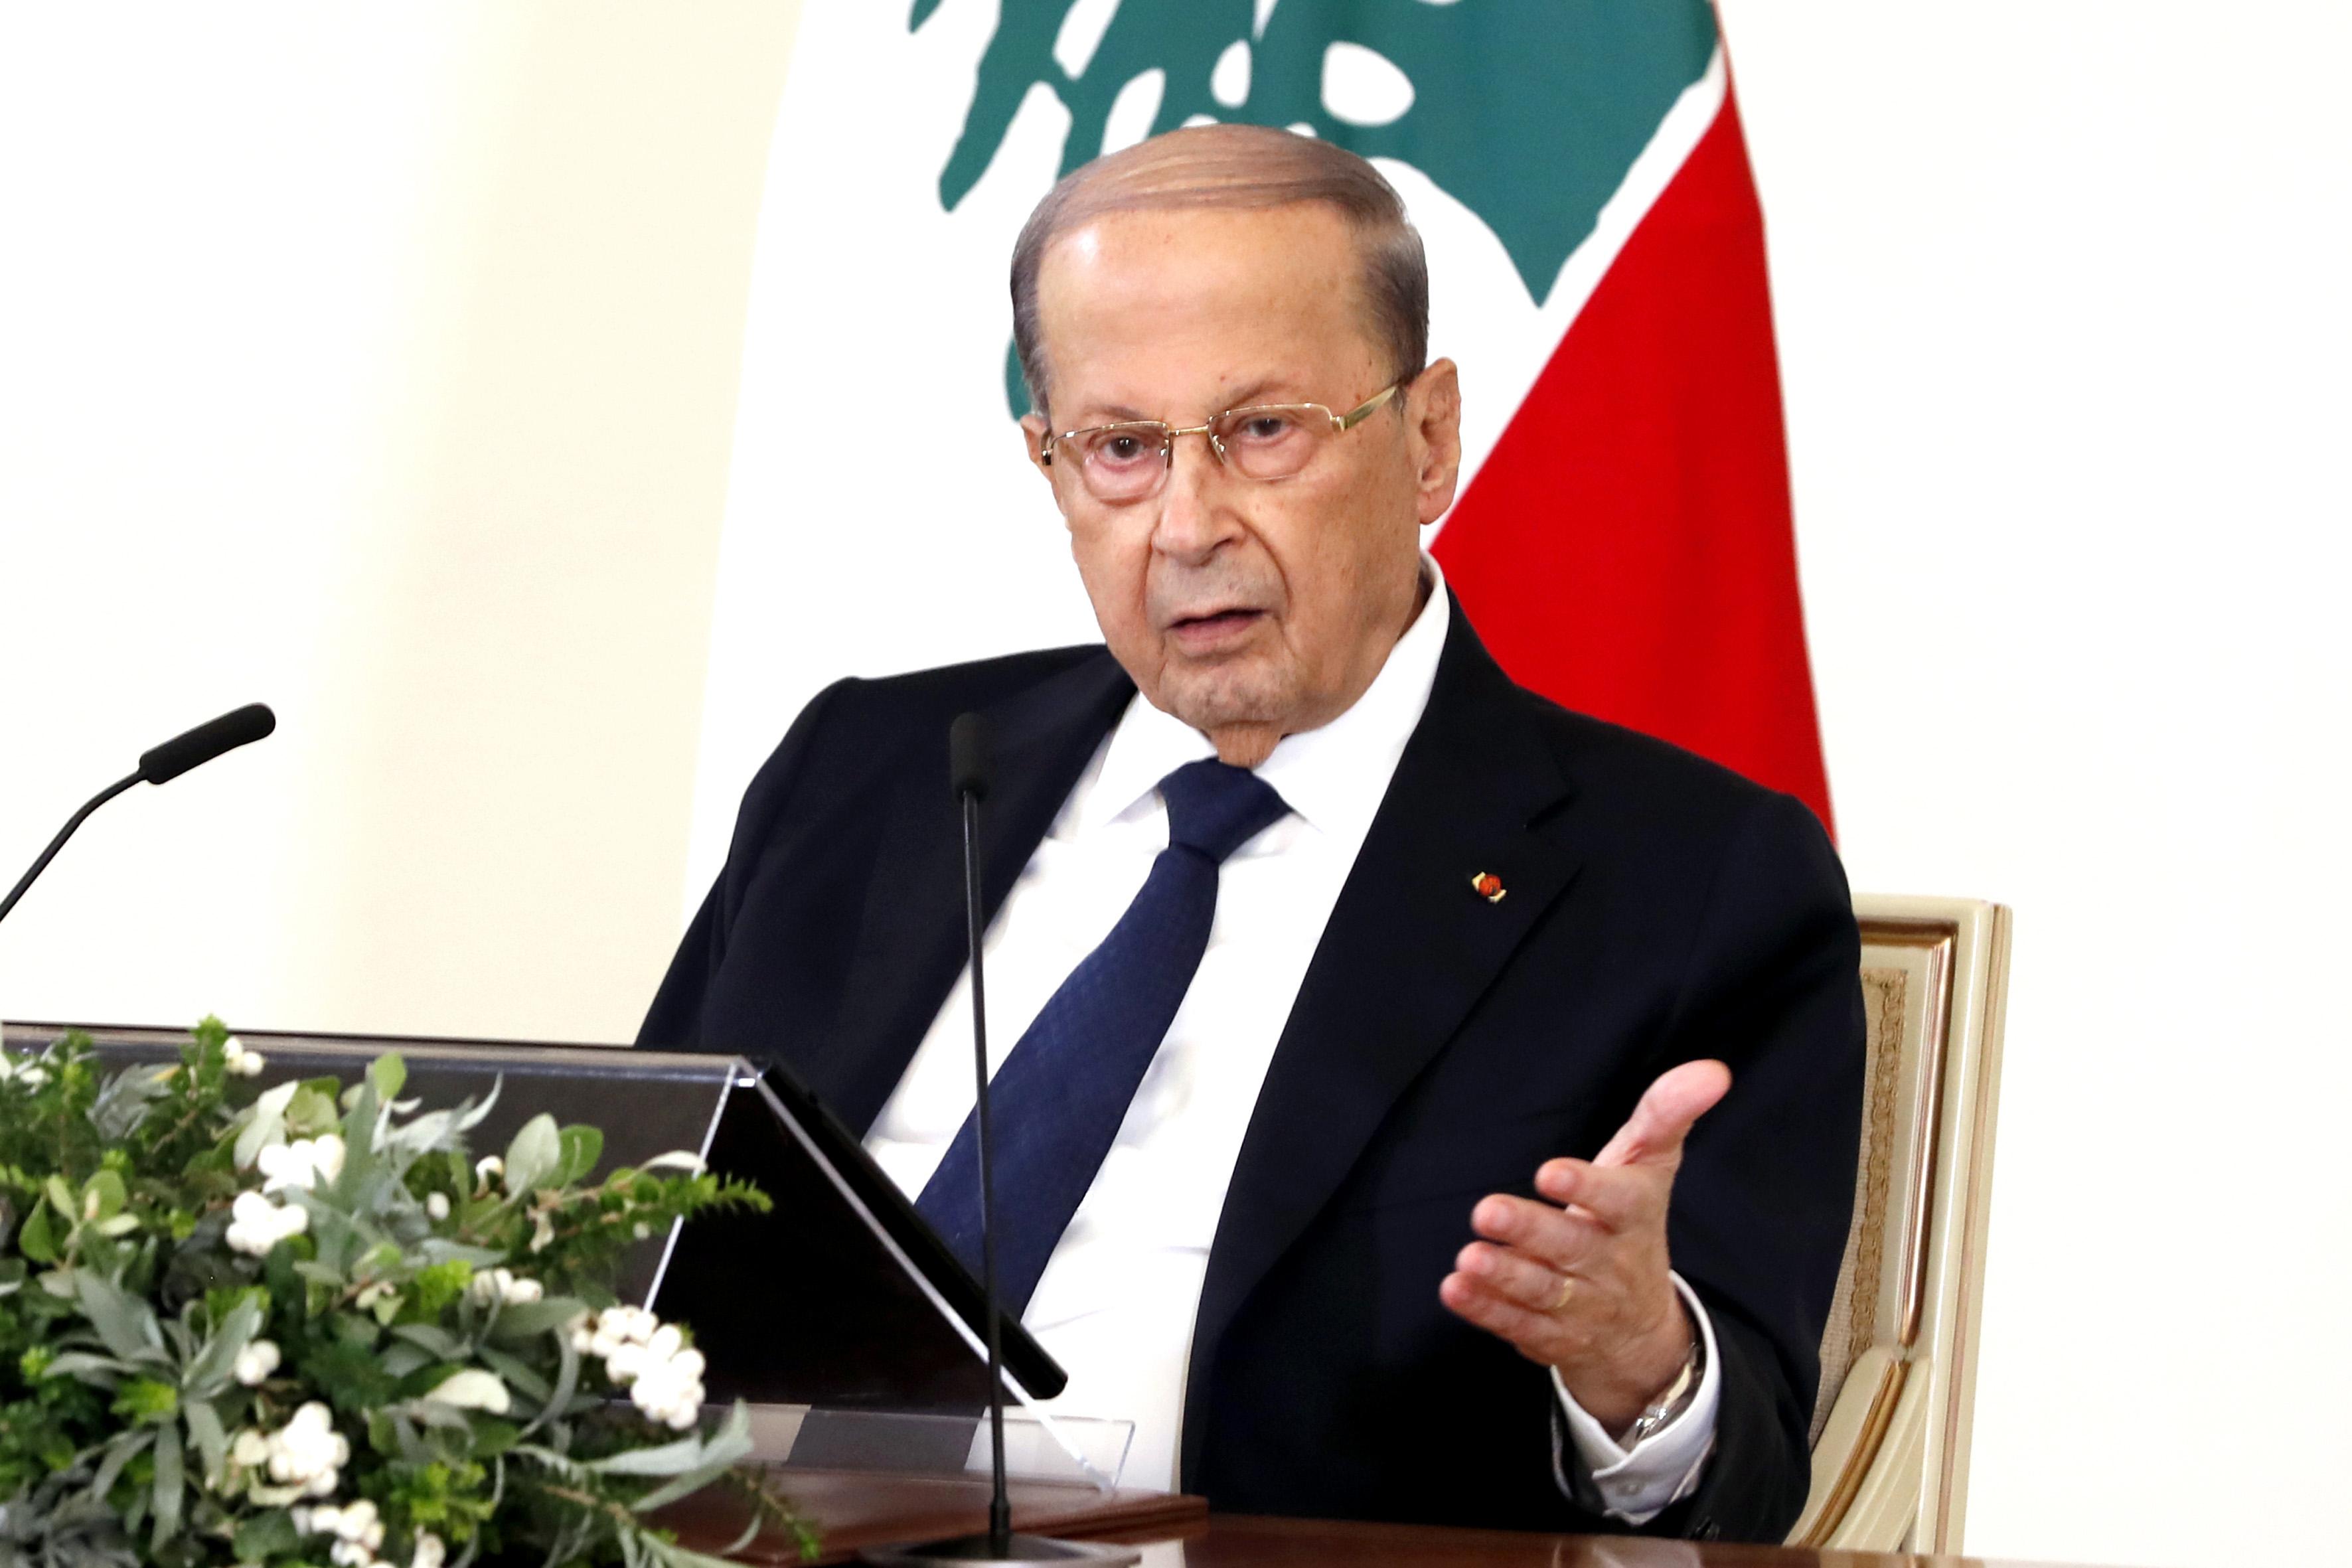 01 - President Michel Aoun press conference 20 oct 2020 (6)